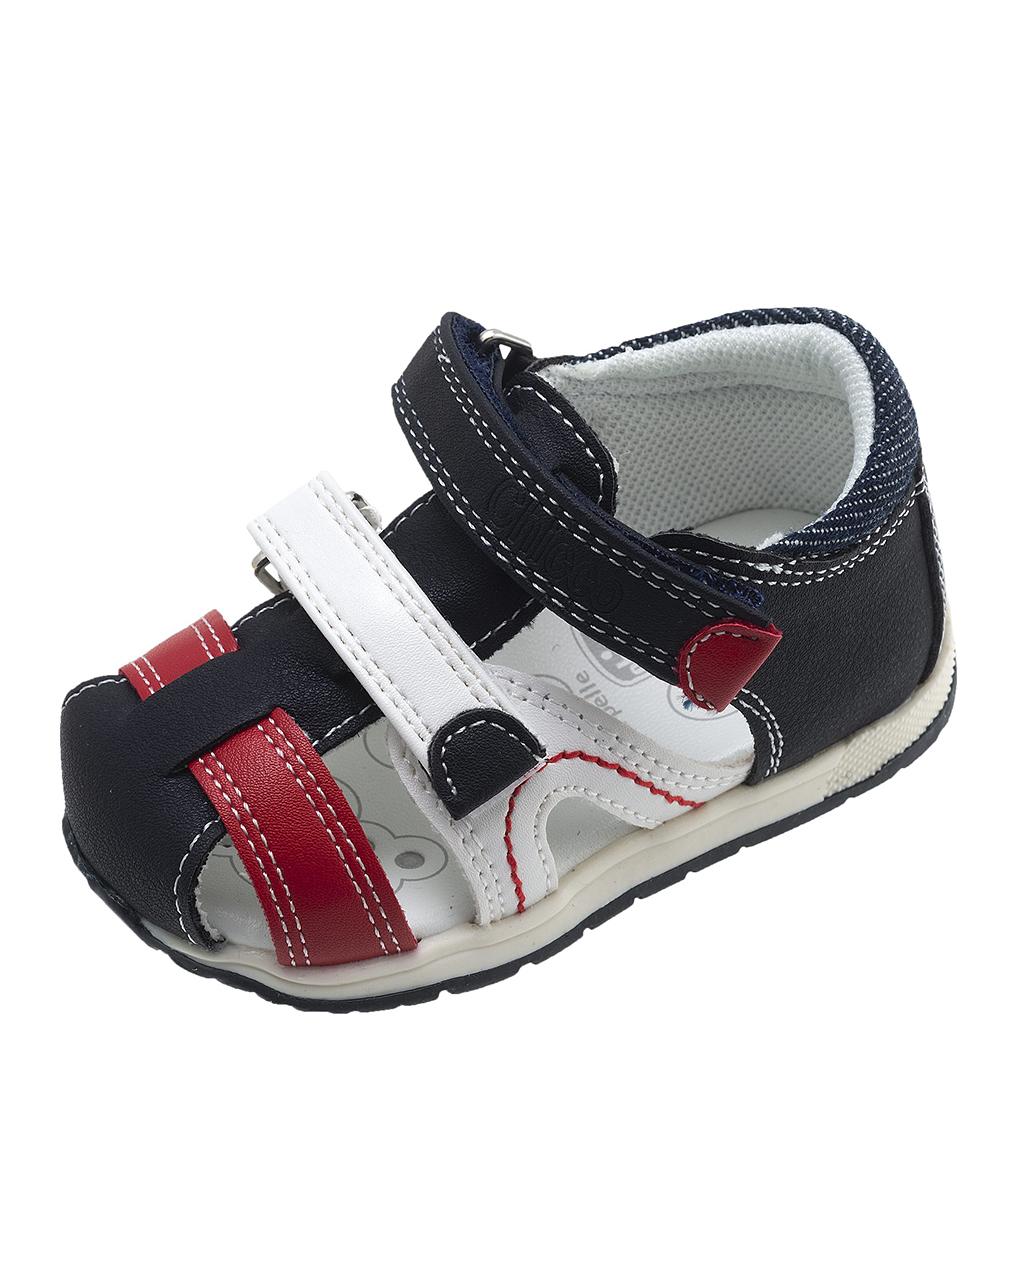 Sandalo maschio gabriel - Chicco